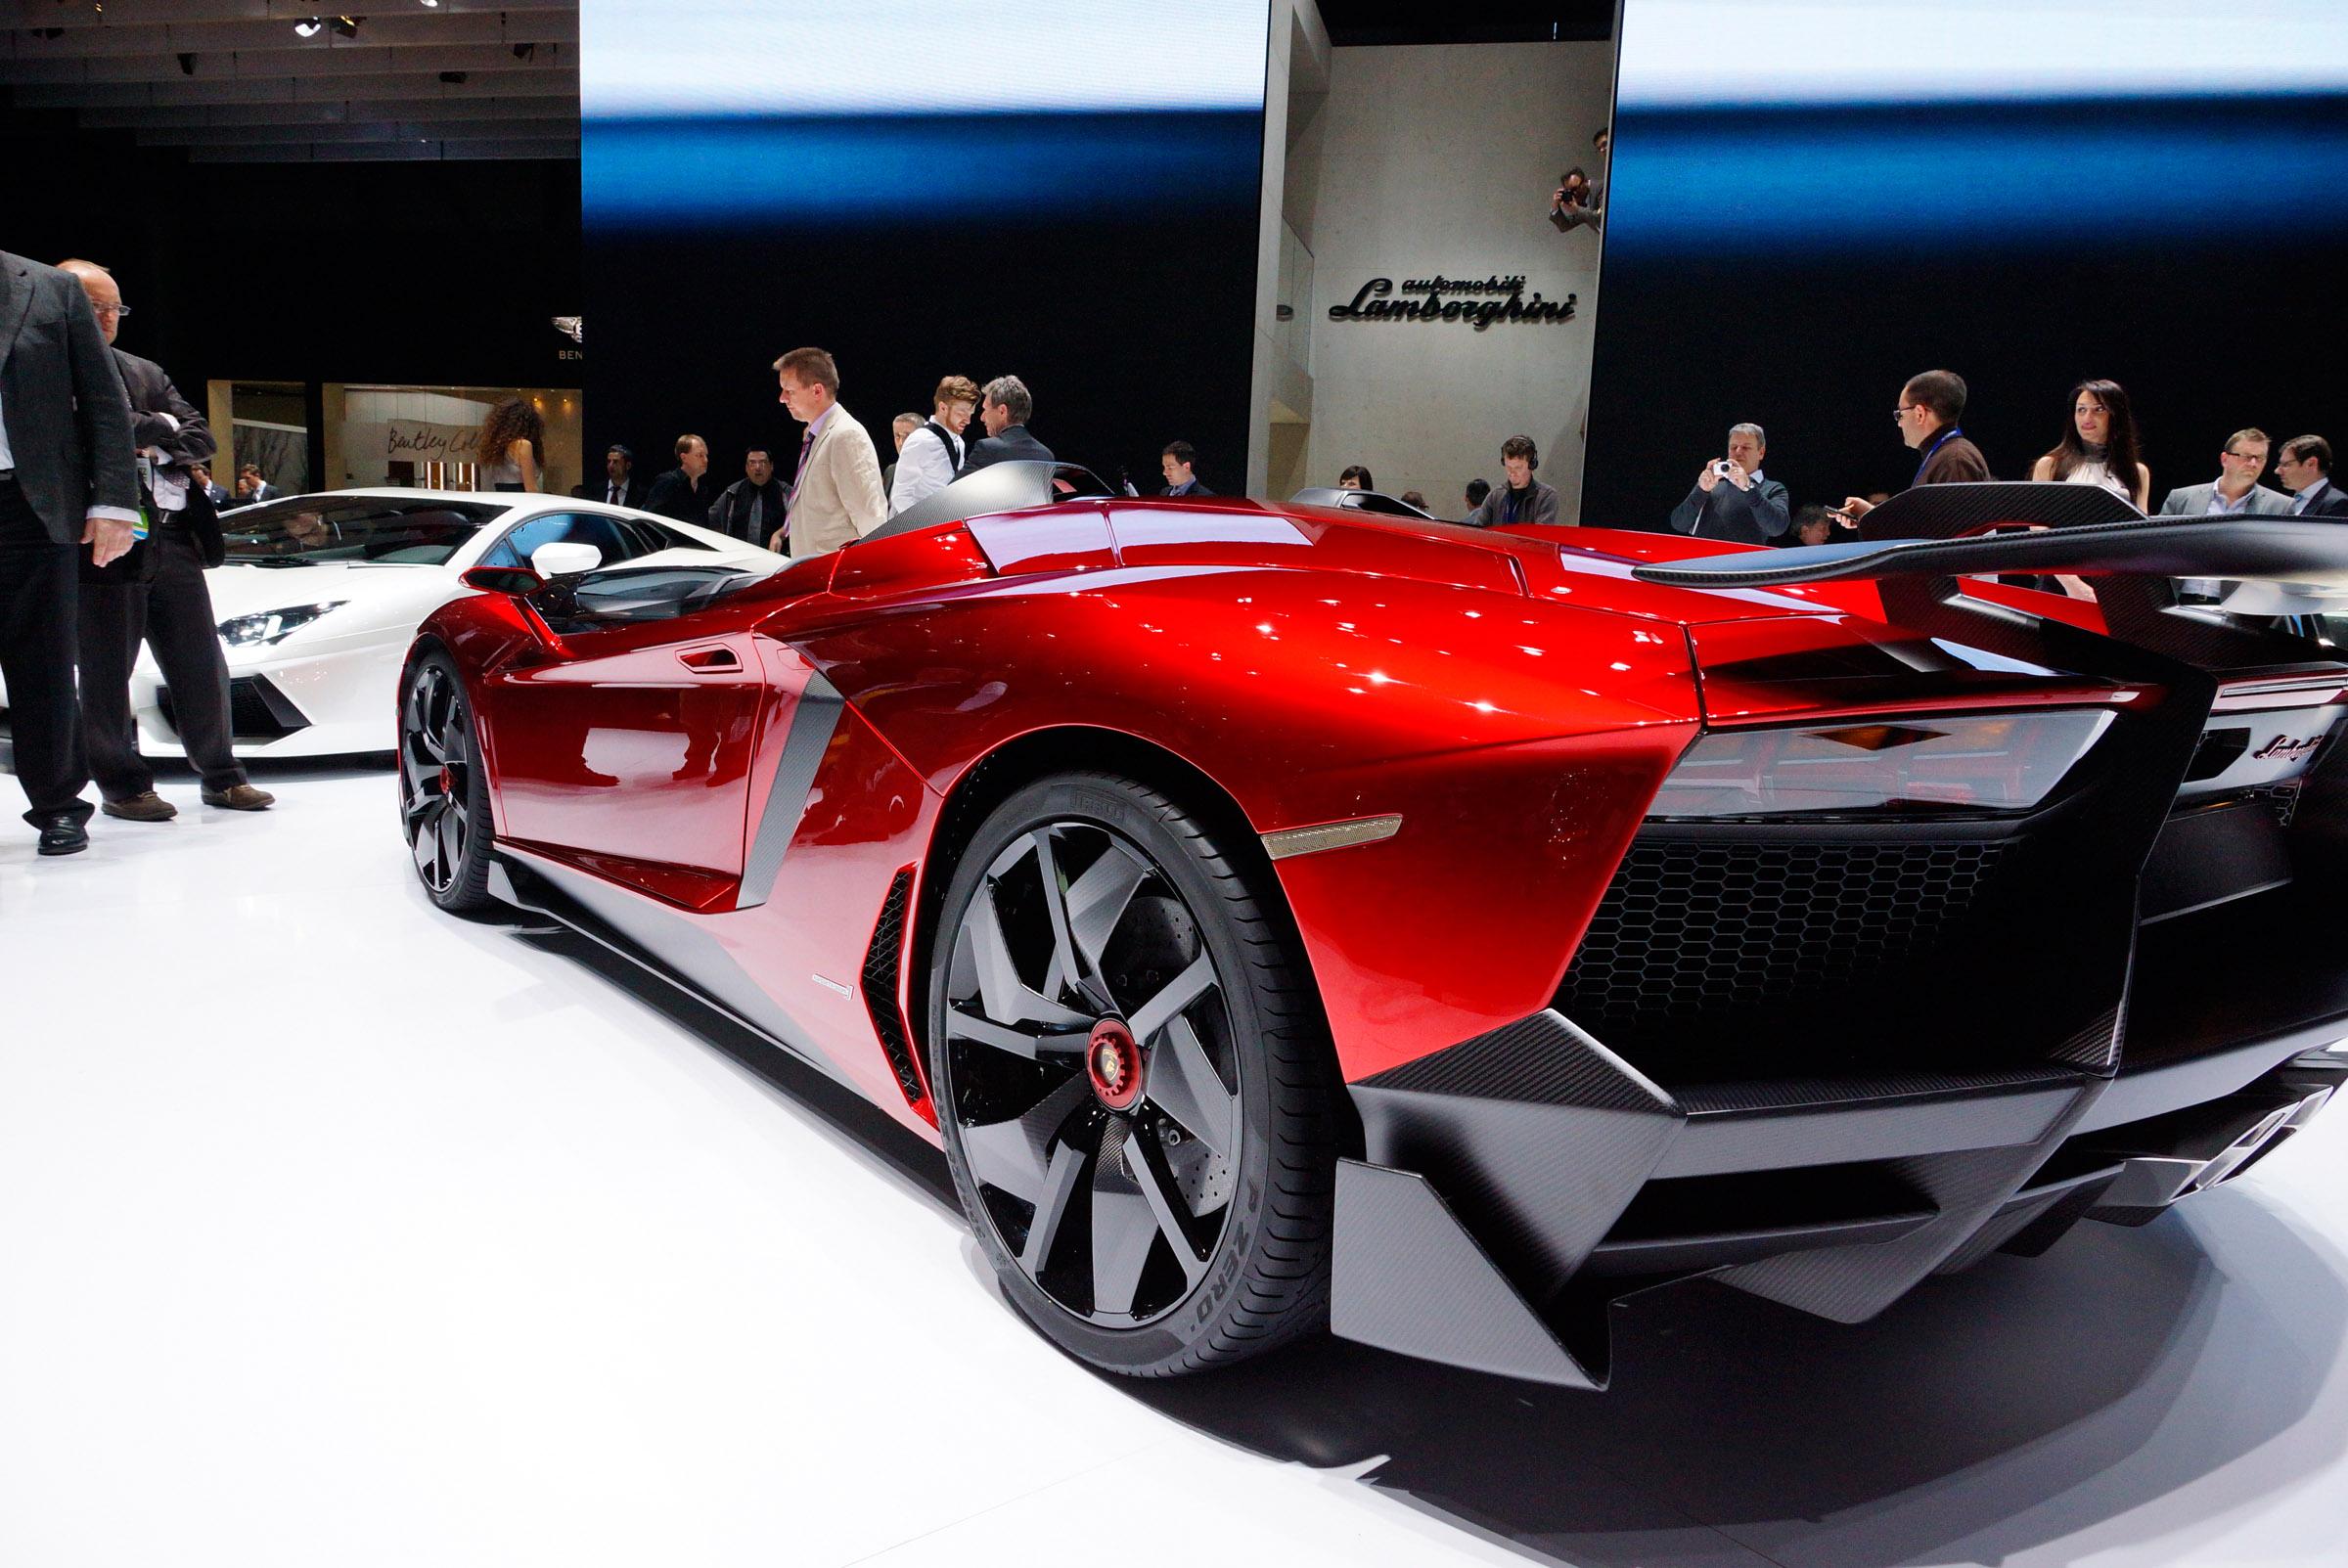 2012 Geneva Motor Show: Lamborghini Aventador J - фотография №6